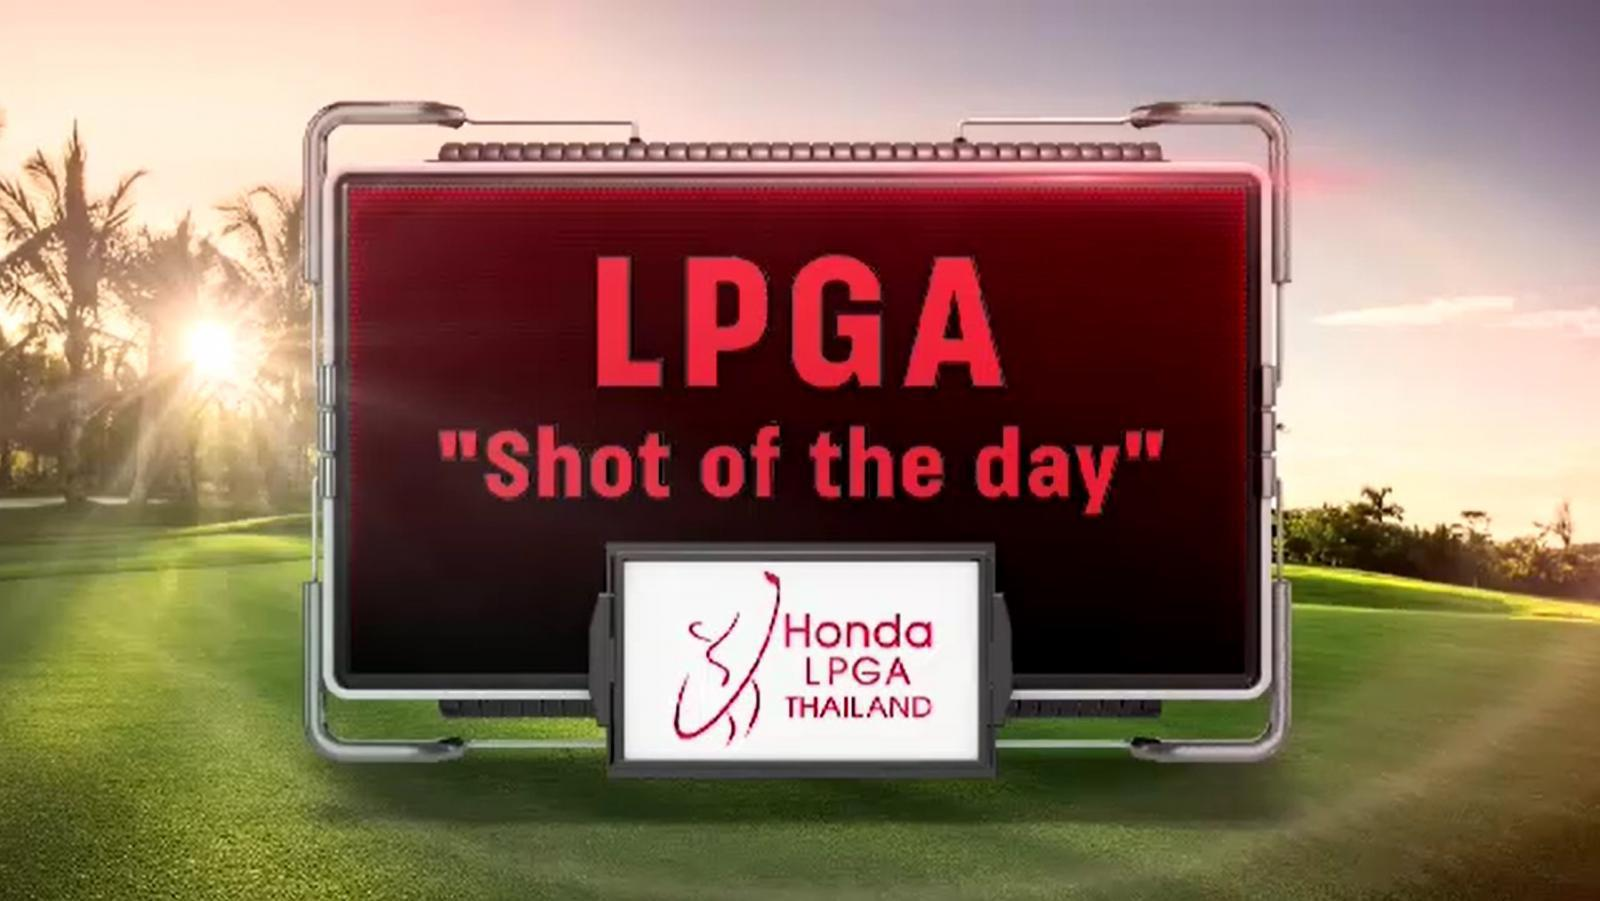 LPGA Shot of the day ประจำวันที่ 6 พ.ค. 64